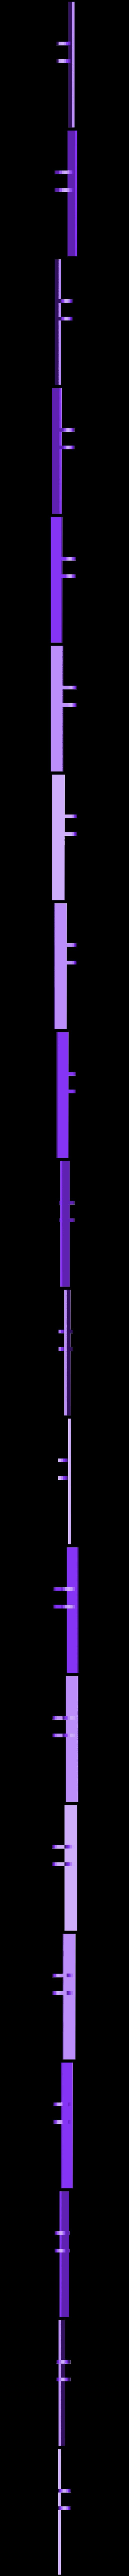 b6MGN9H_for_e3d_v6_light_pl.stl Download free STL file Holder for e3d v6 hotend to MGN9H carrier • Design to 3D print, tigorlab